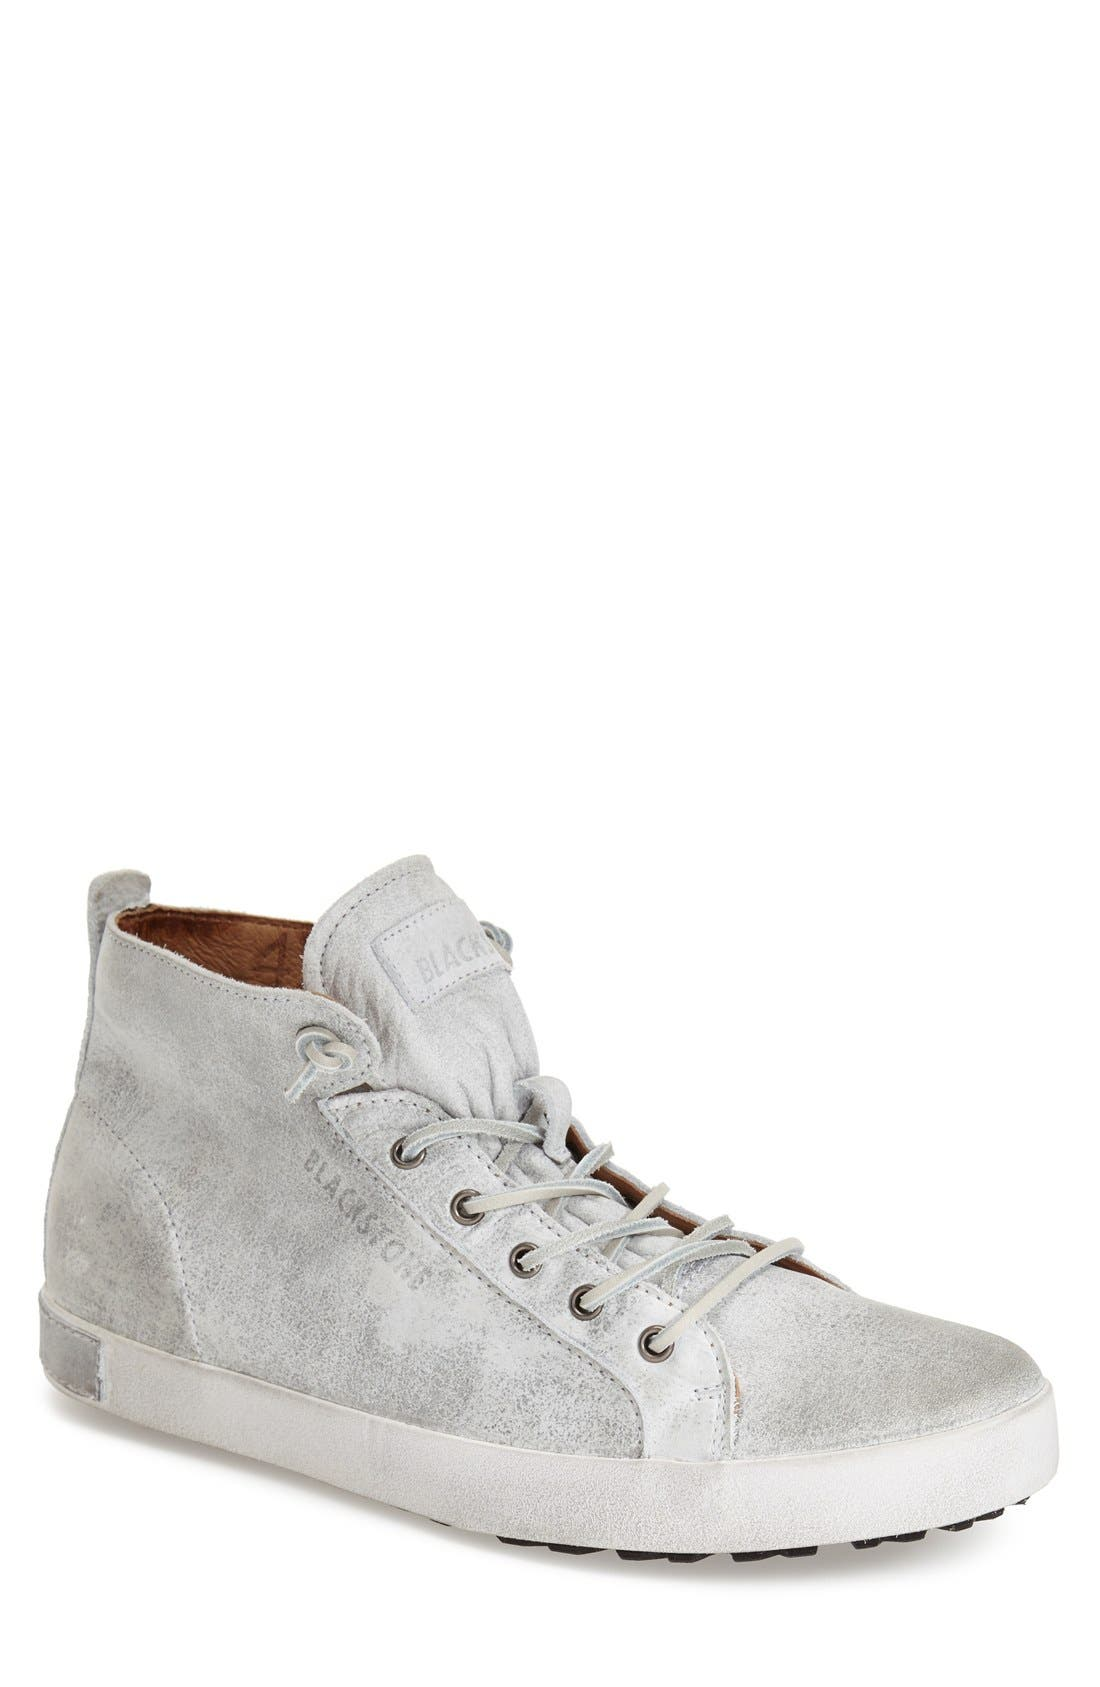 BLACKSTONE 'JM 02' High Top Sneaker